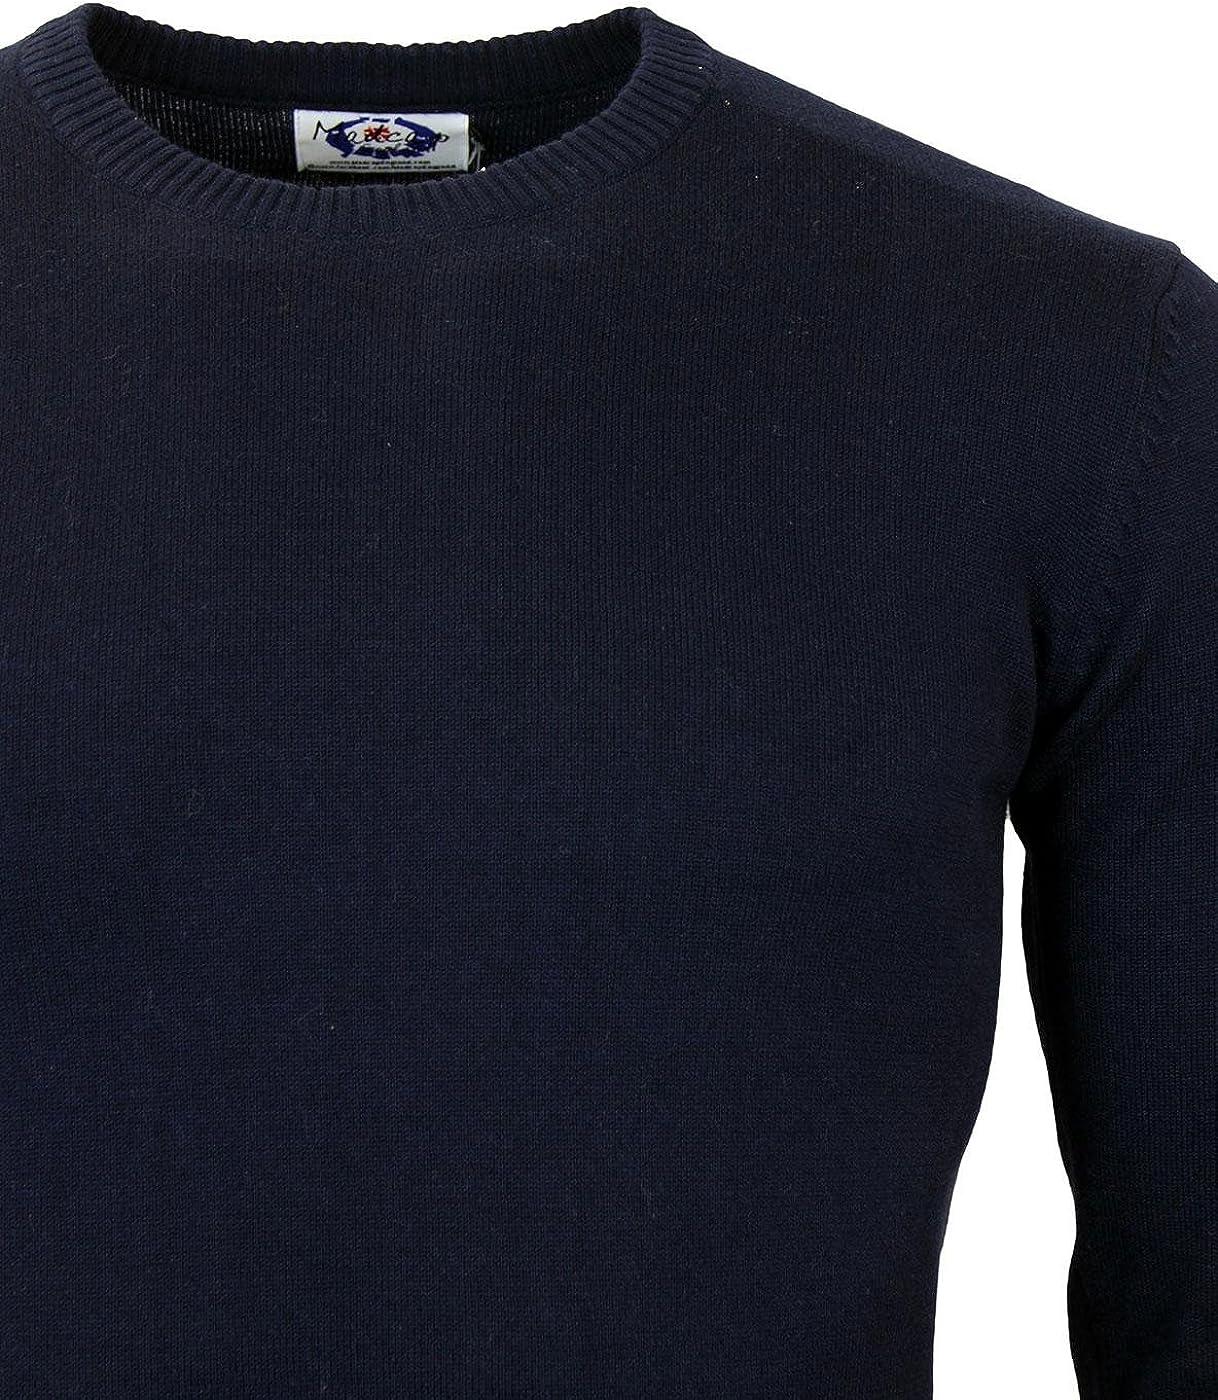 Madcap England Herren Strickjacke Blau Marineblau//rot